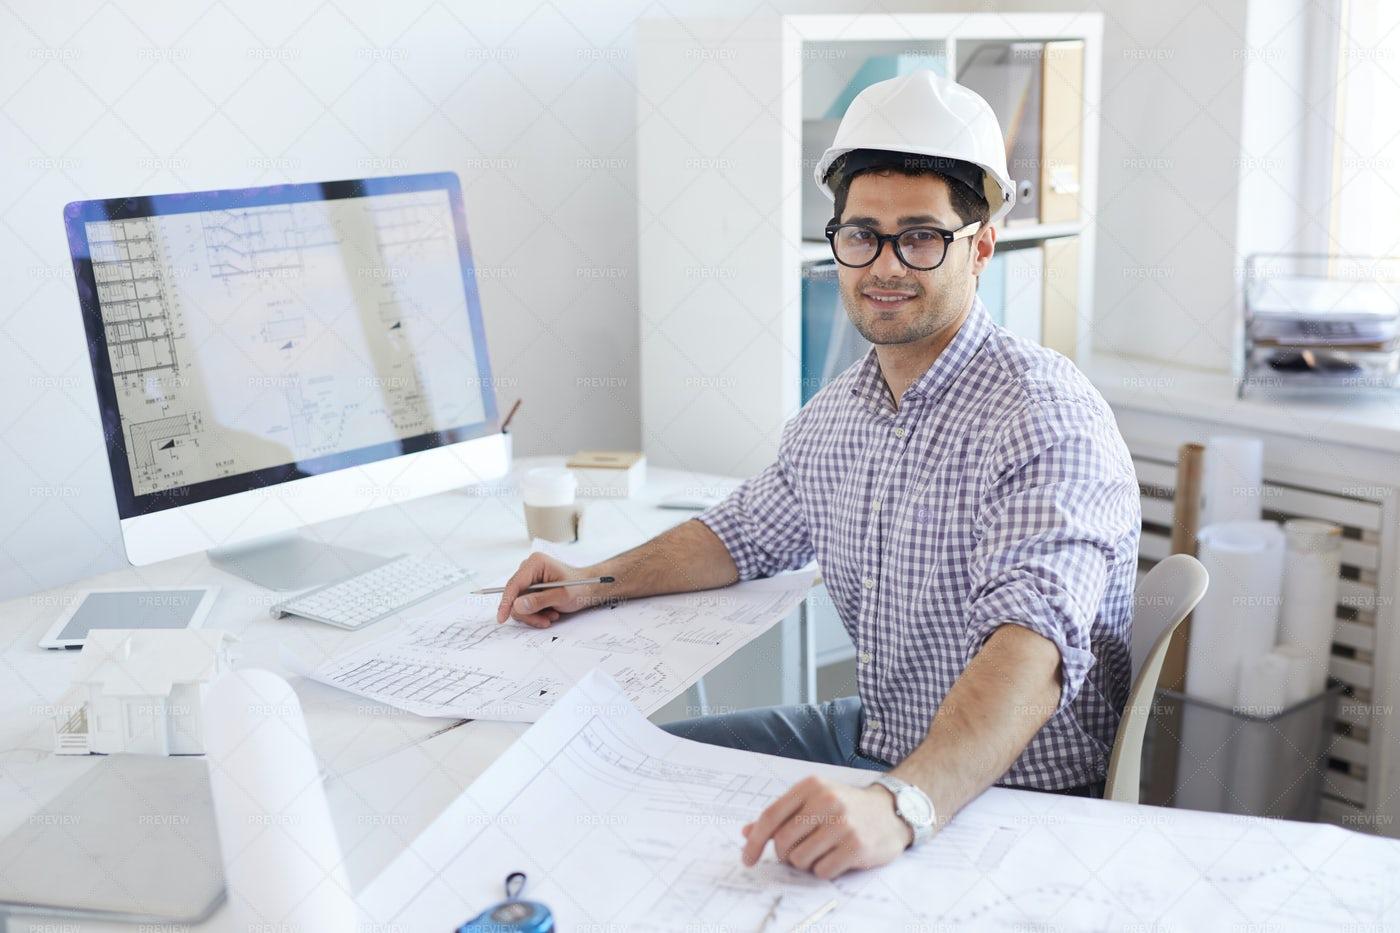 Smiling Engineer Posing At...: Stock Photos